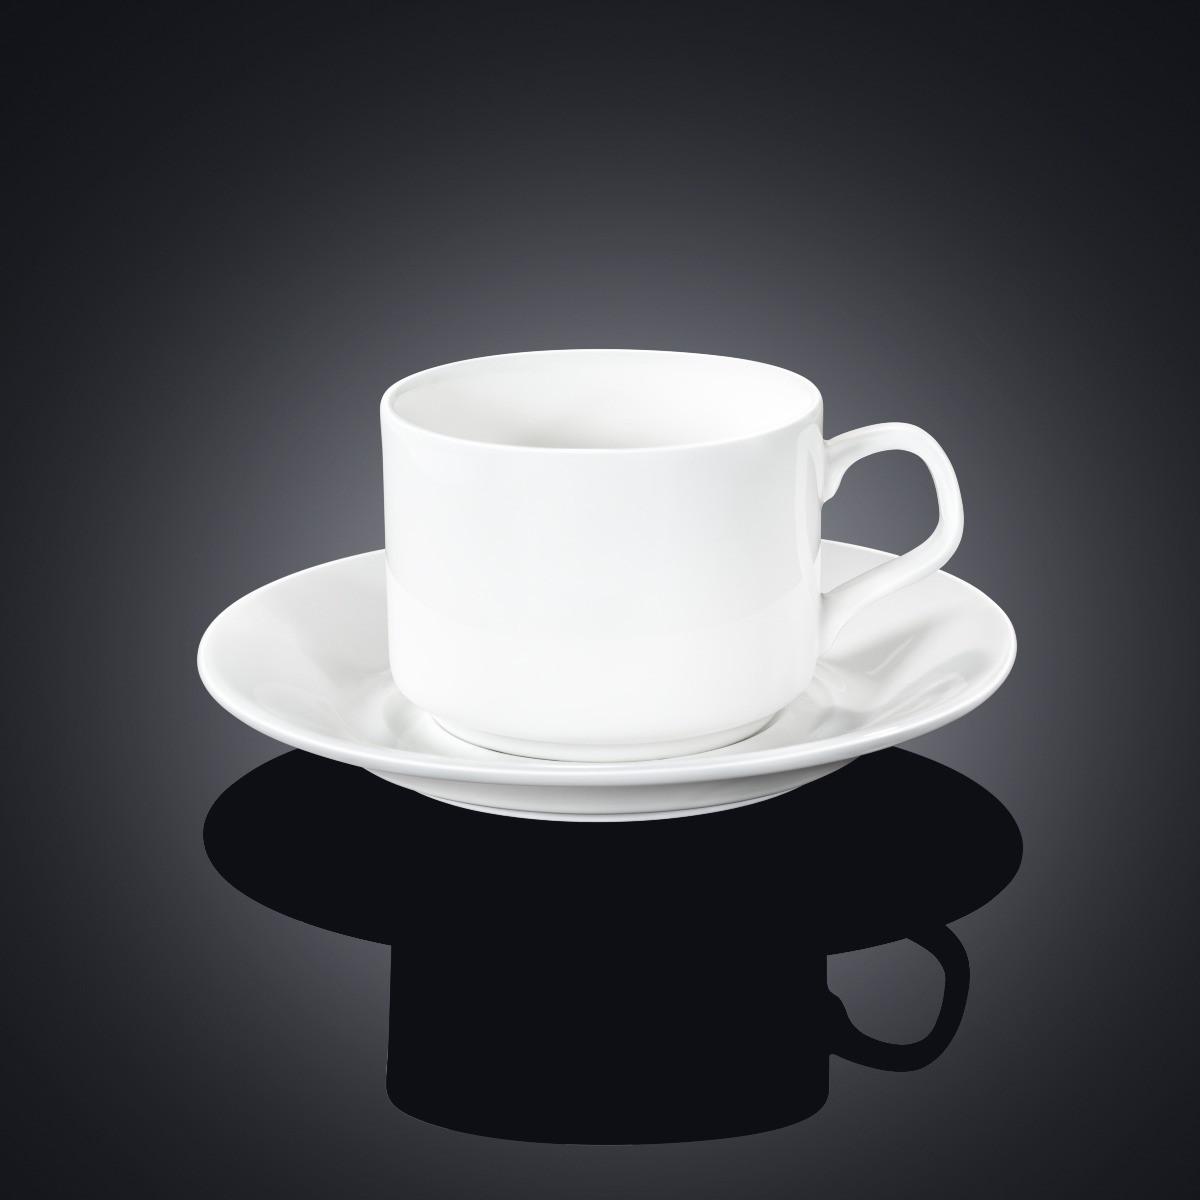 Чашка чайная + блюдце Wilmax 215мл